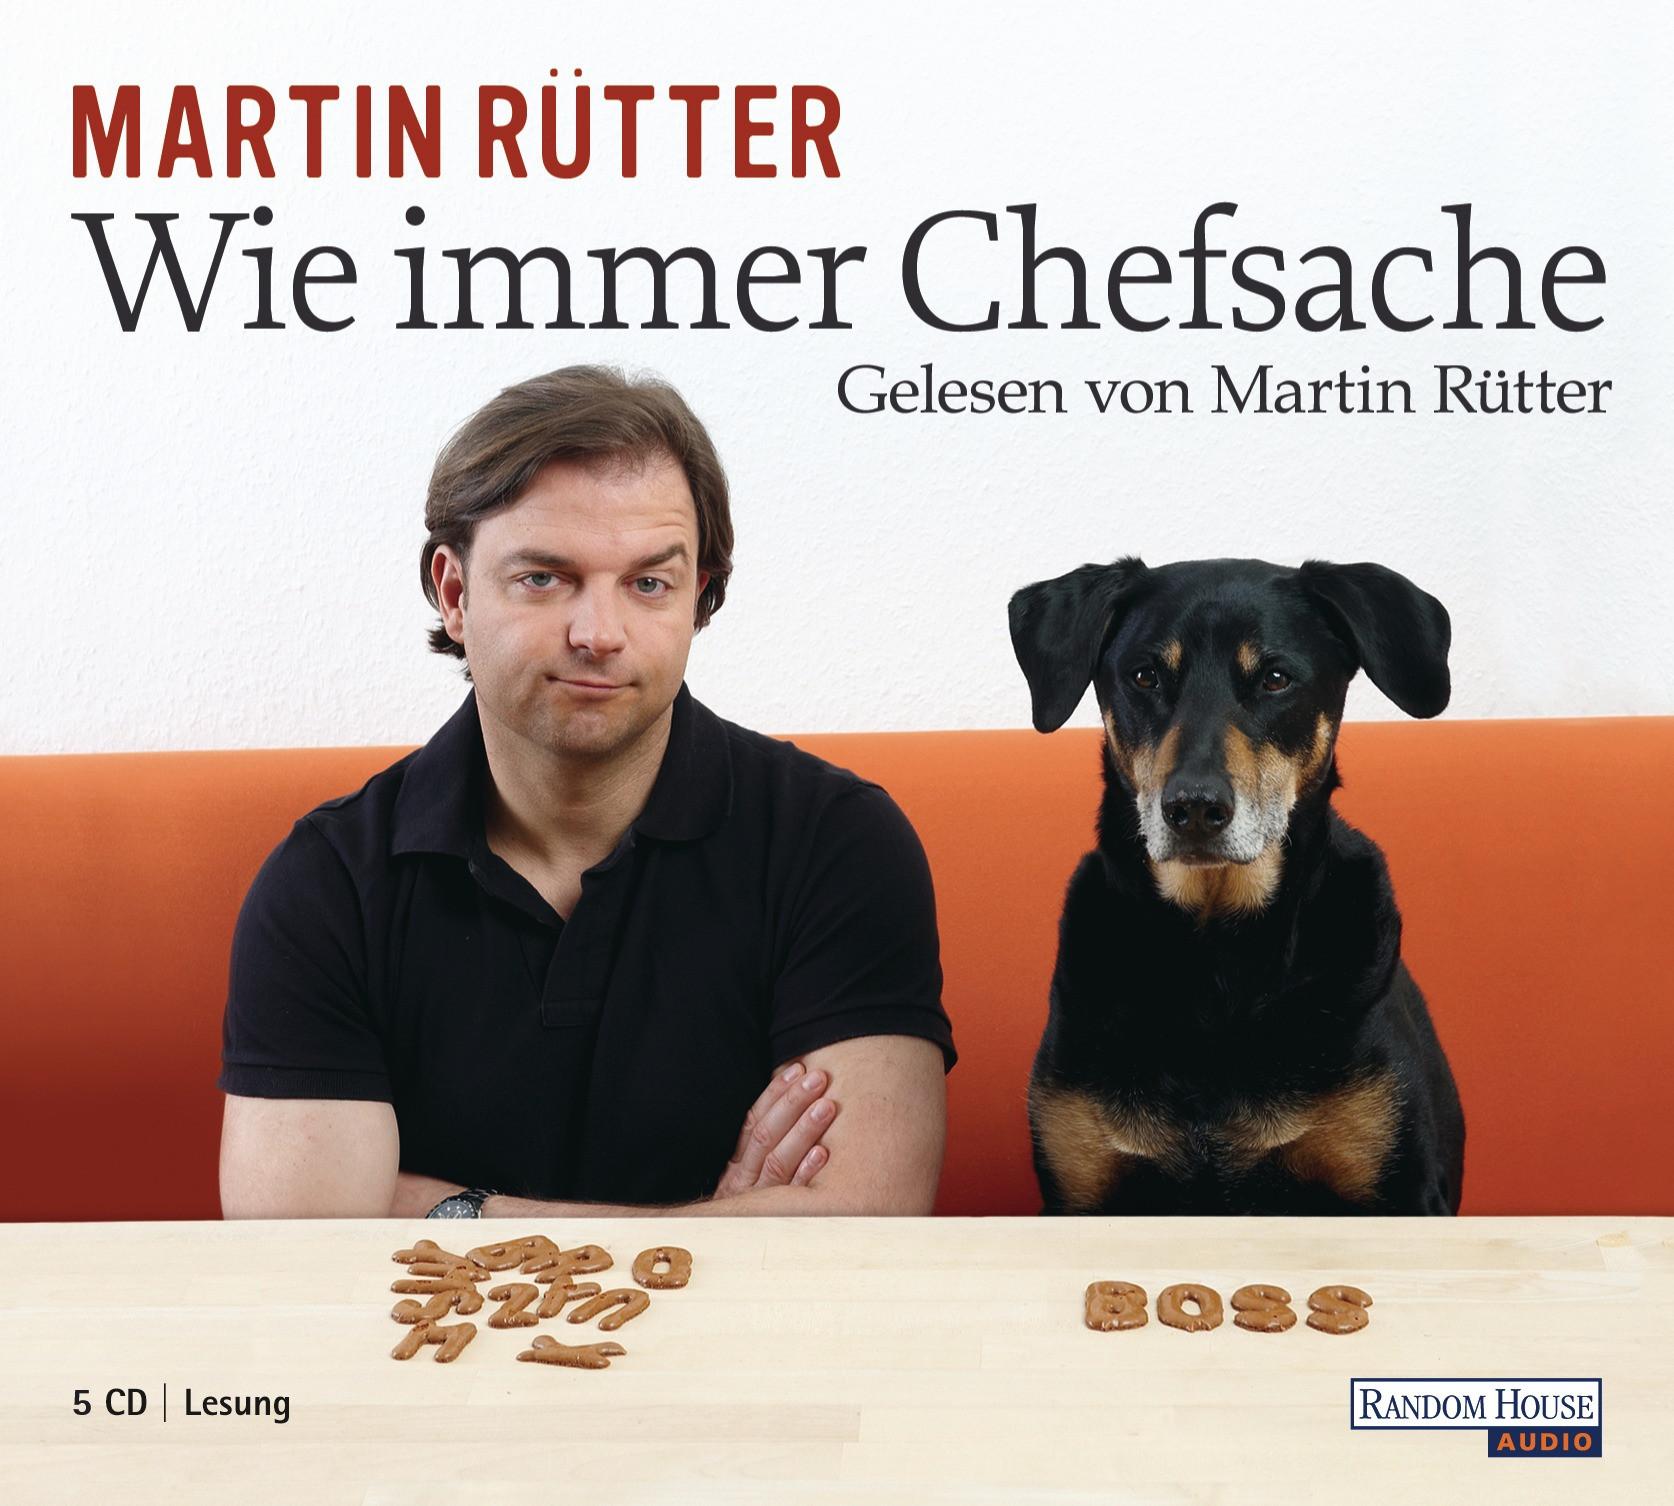 Martin Rütter - Wie immer Chefsache